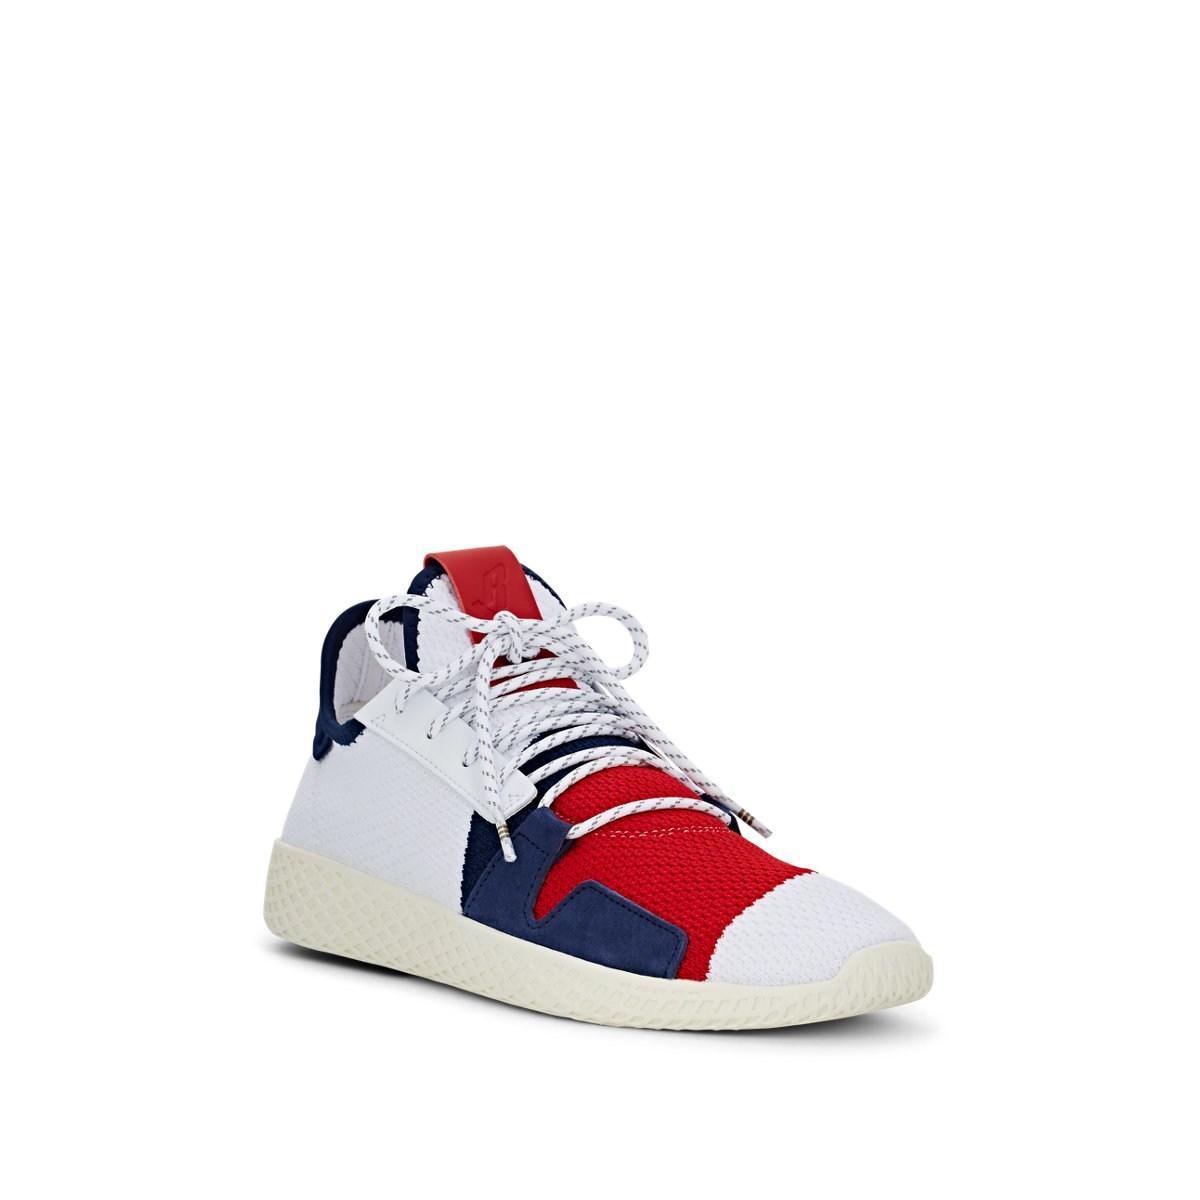 a6e7bc6eab00b Adidas - White Bbc Tennis Hu V2 Nmd Sneakers for Men - Lyst. View fullscreen